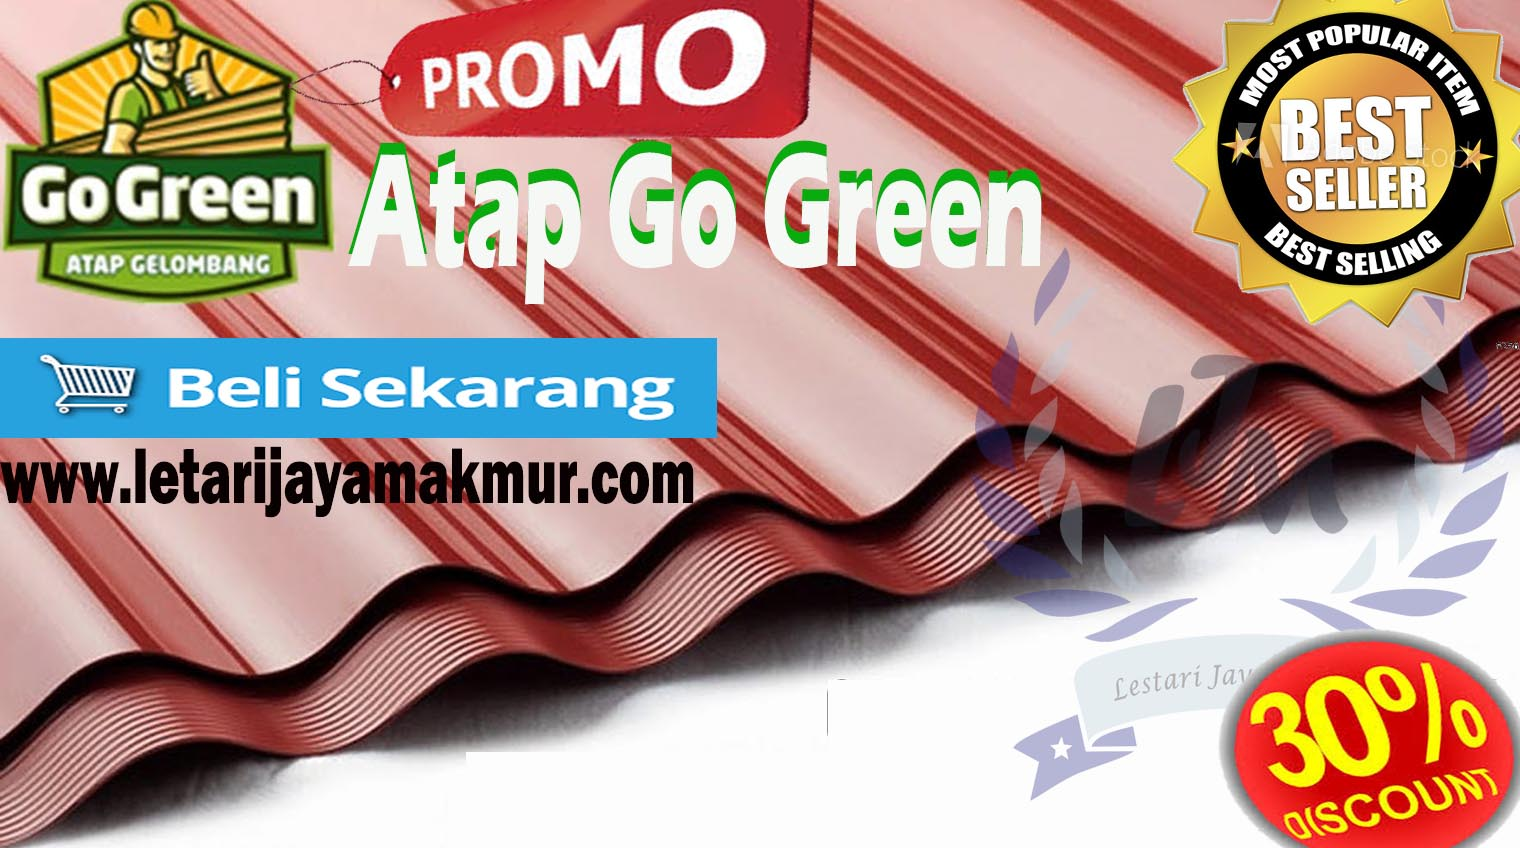 harga atap go green terbaru